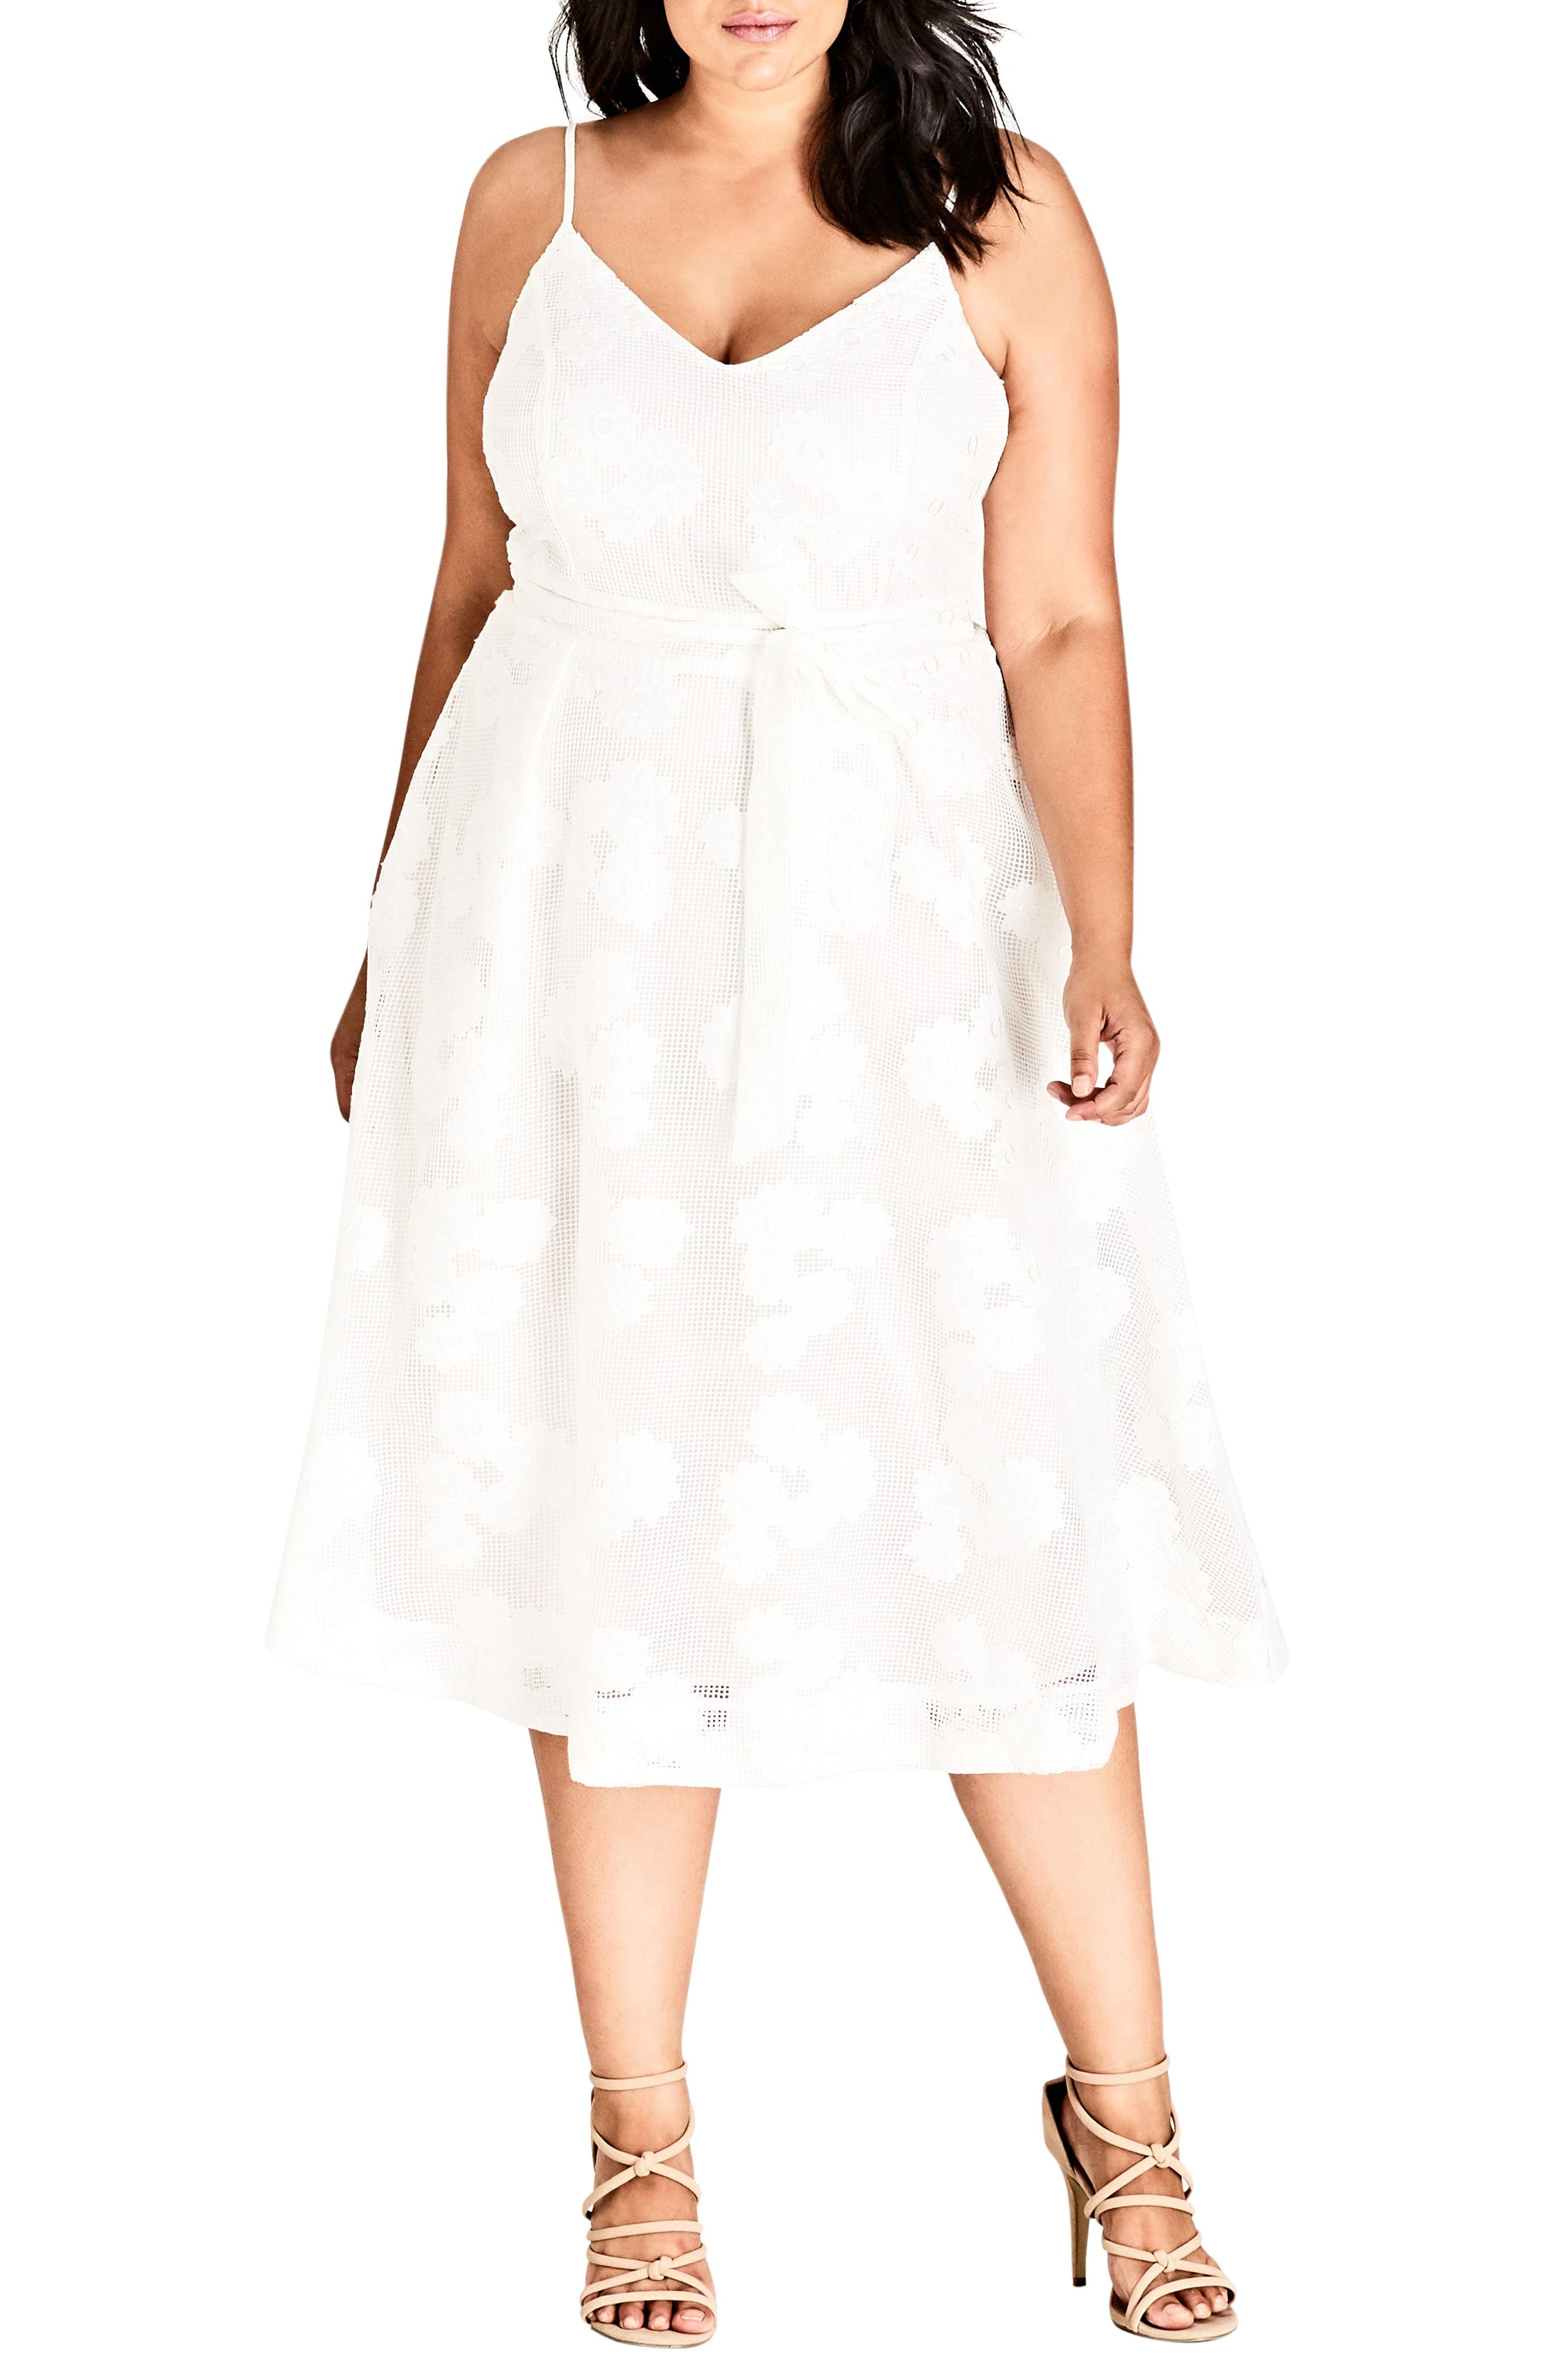 Plus Size City Chic Love Fling Dress, Ivory